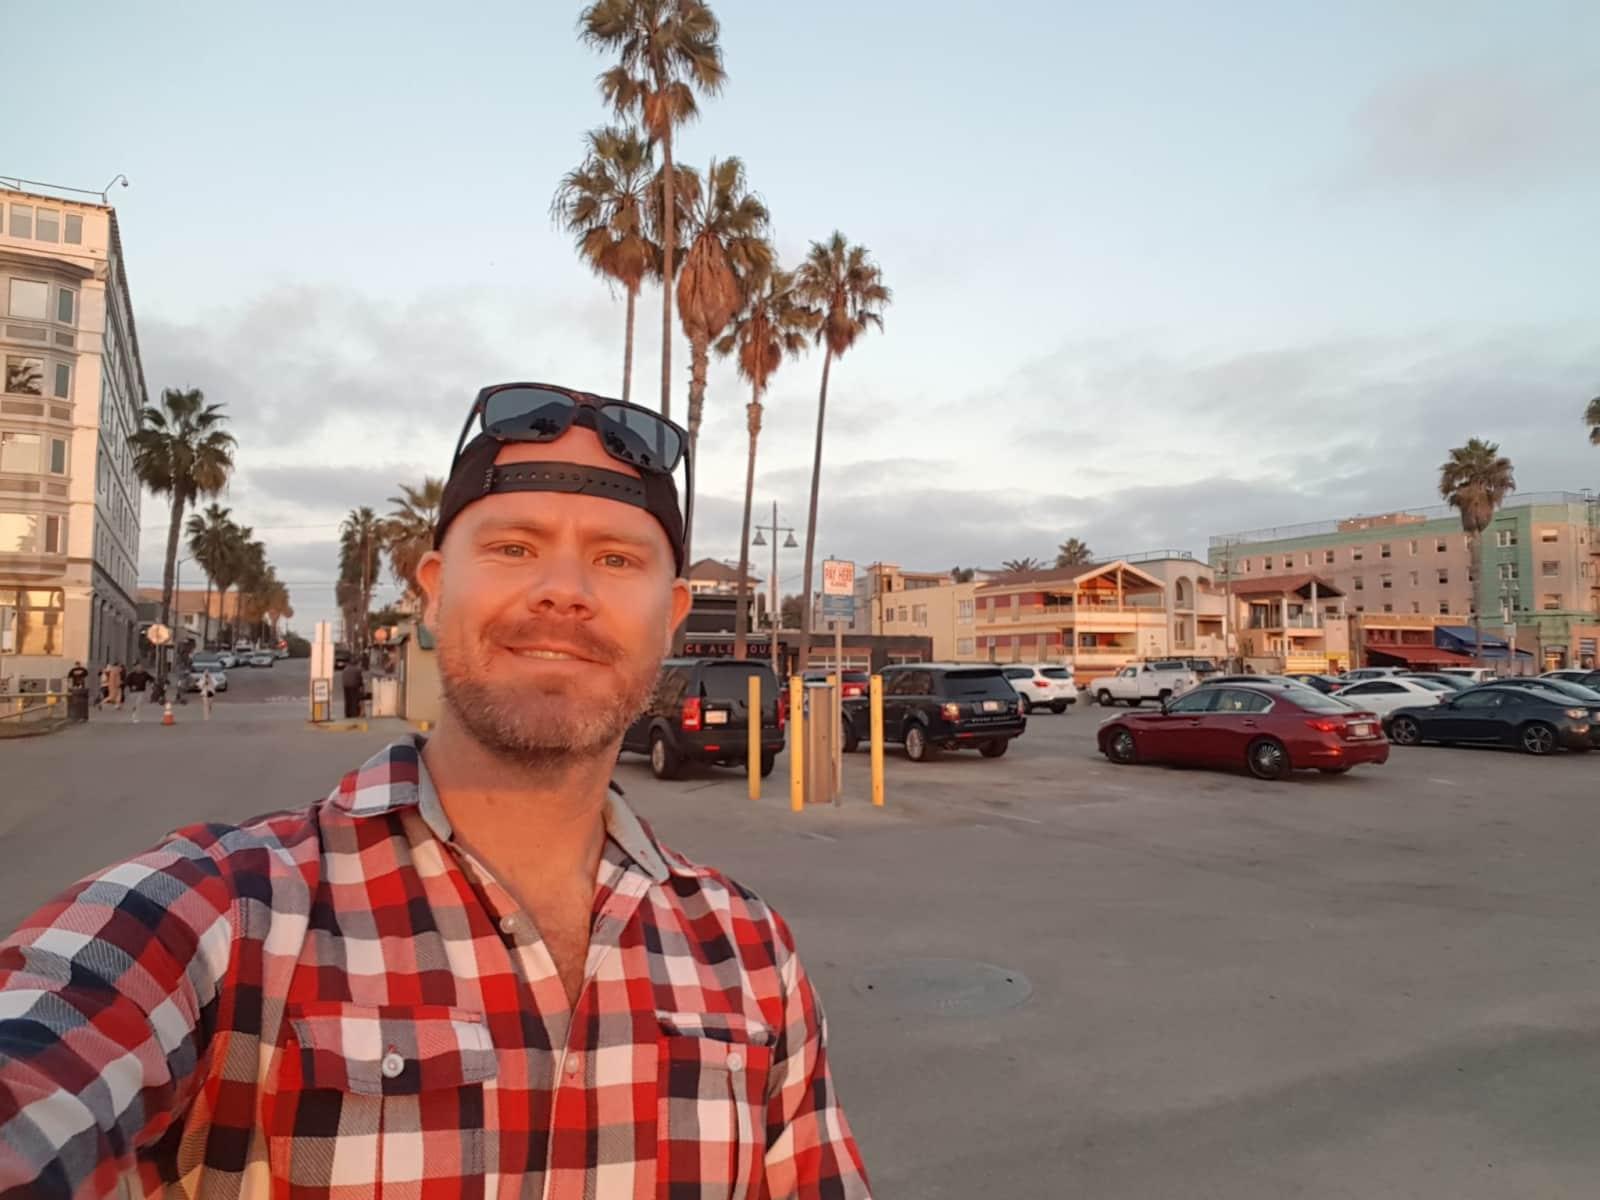 Jason from Adelaide, South Australia, Australia